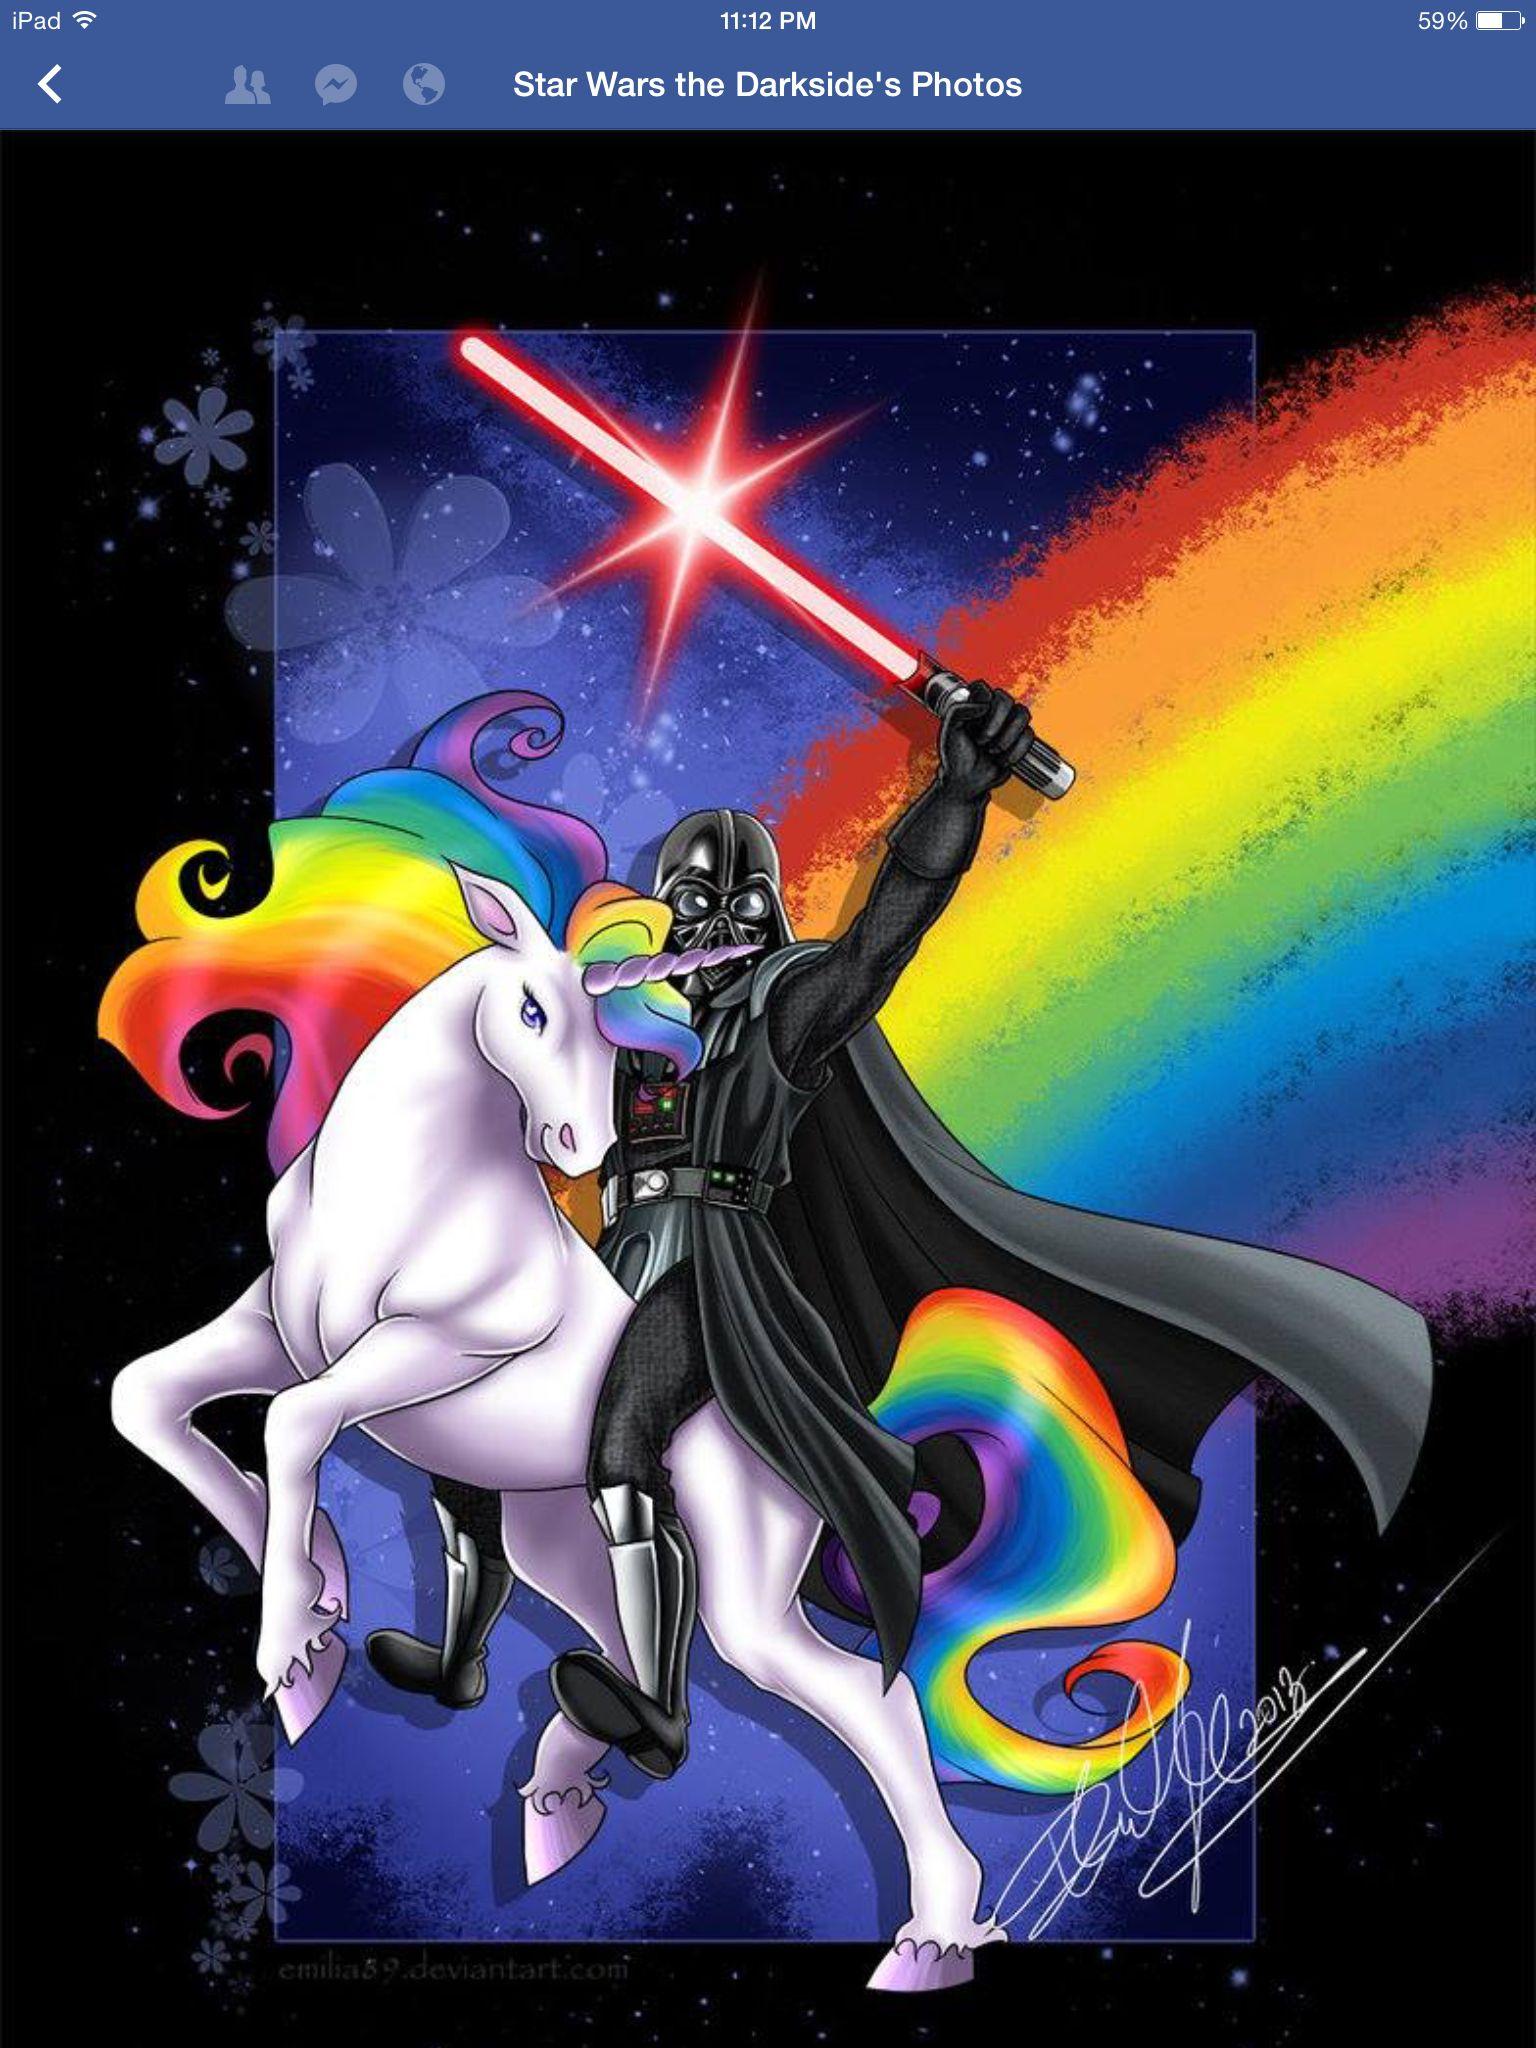 7a1e91d2 Darth Vader on a rainbow unicorn | Starwars | Star wars, Star wars ...